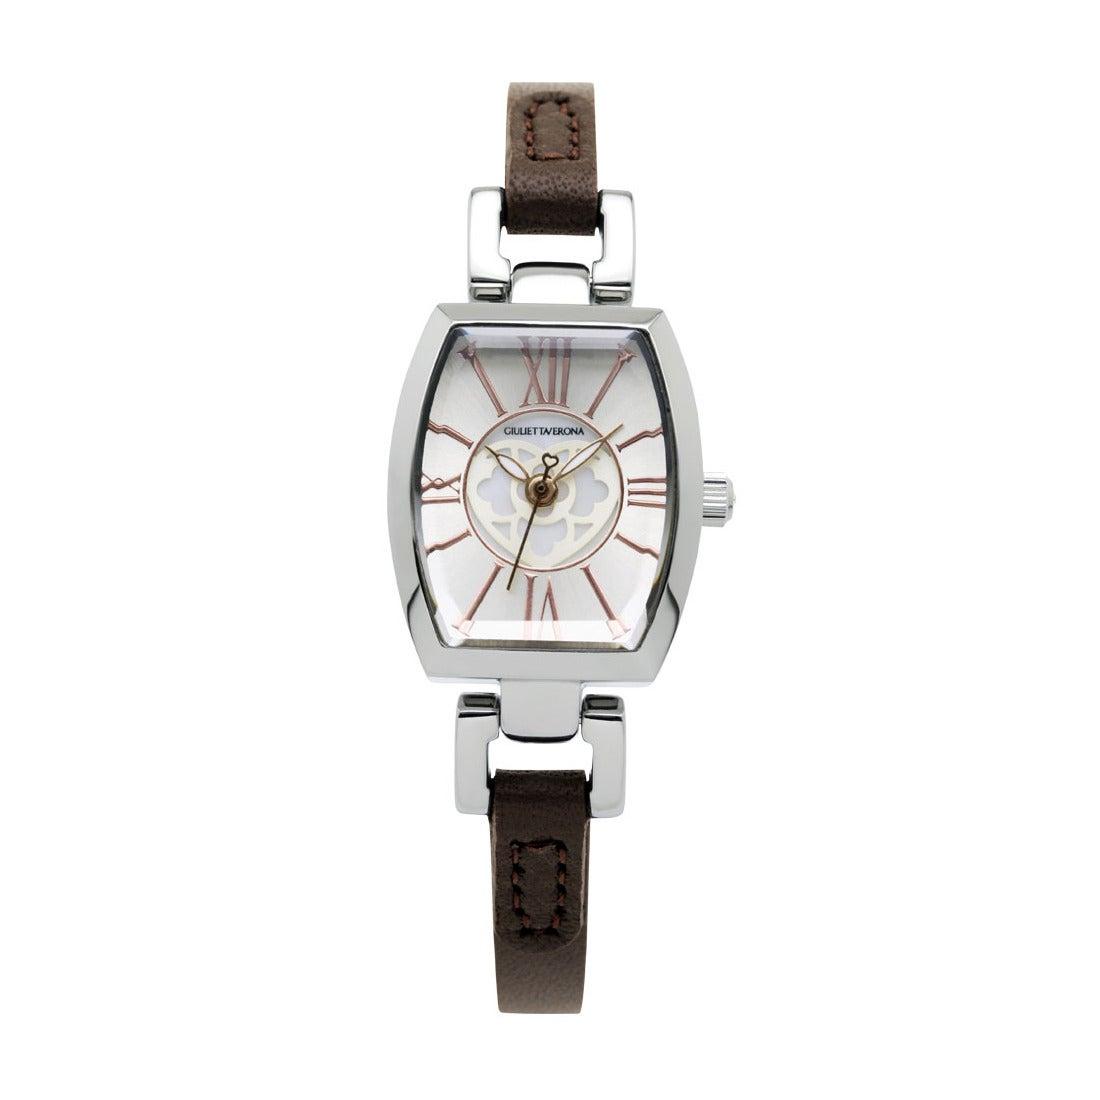 【SAC'S BAR】ジュリエッタヴェローナ GIULIETTAVERONA 腕時計 GV006 LOVE VERONA シルバー×ブラウン